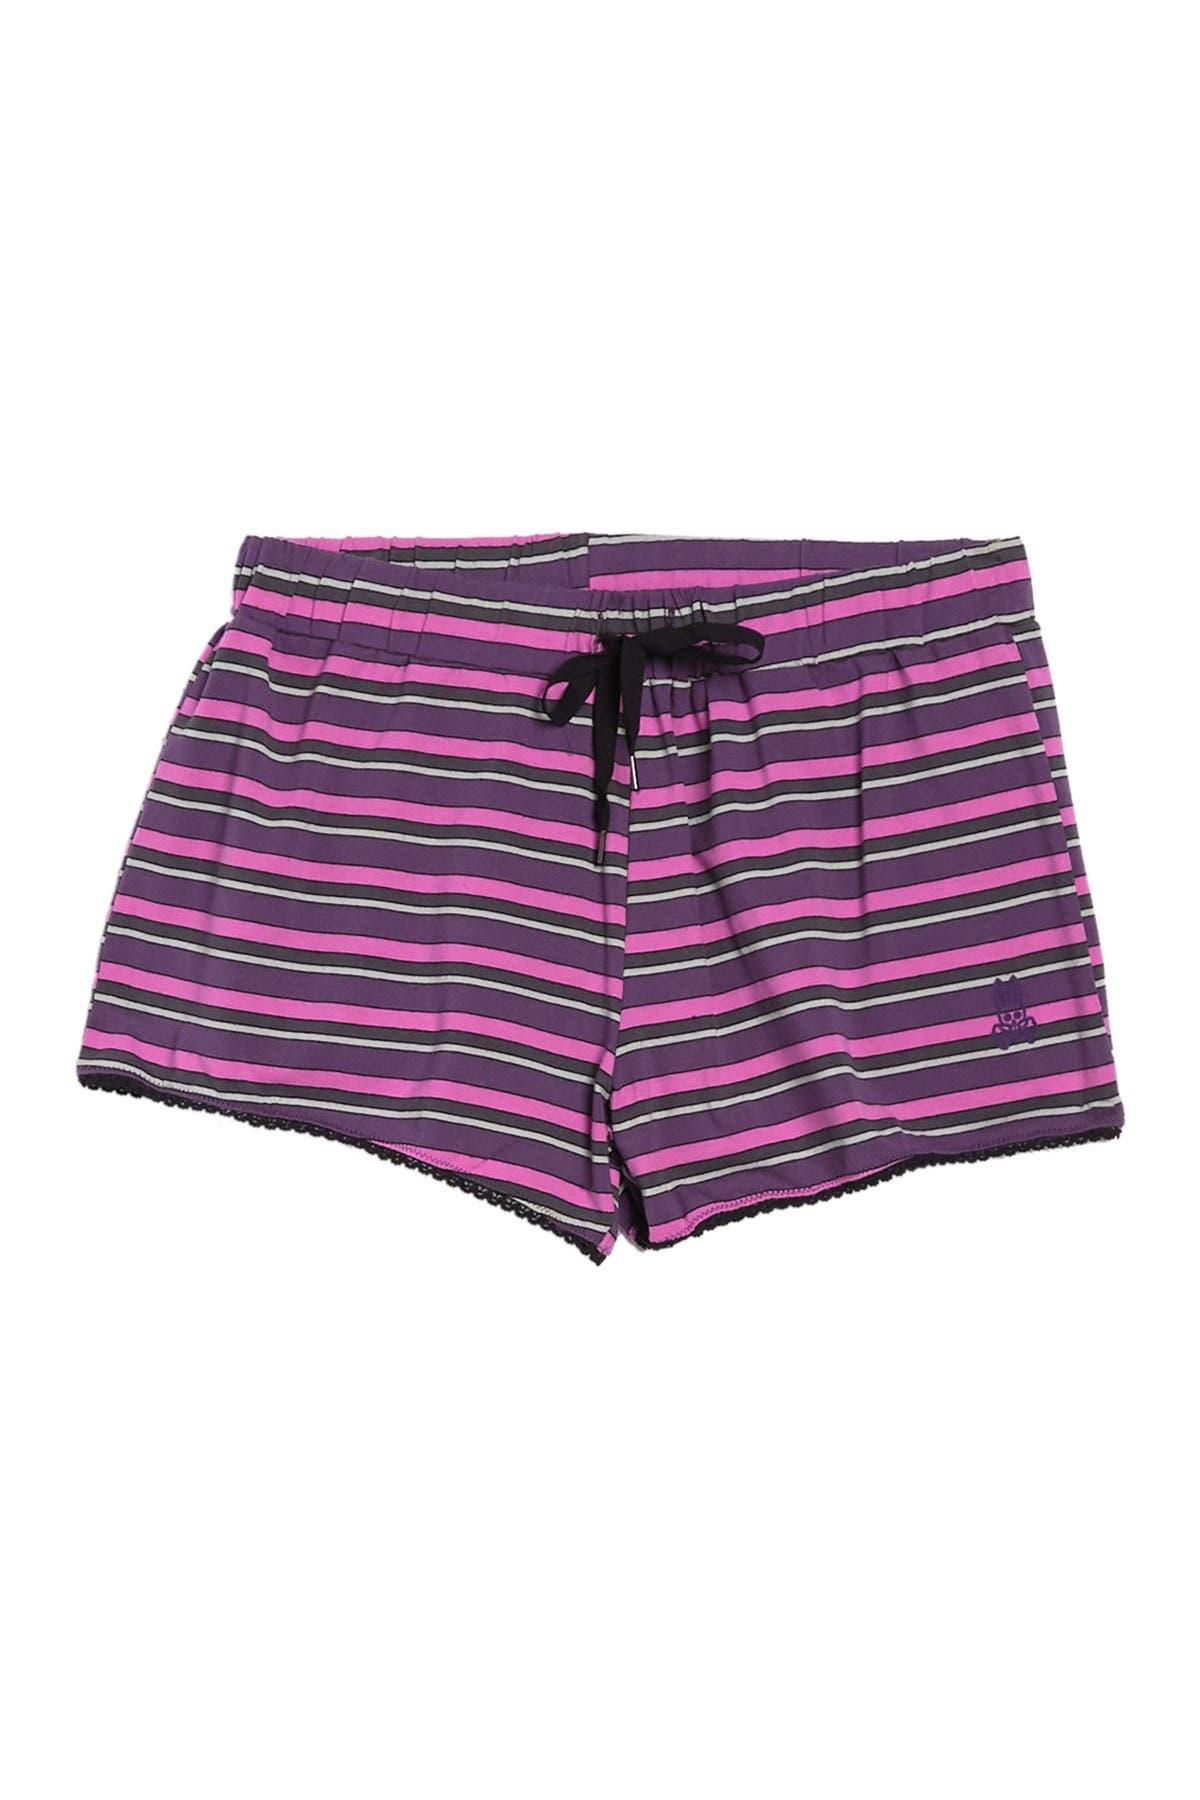 Image of Psycho Bunny Pajama Shorts